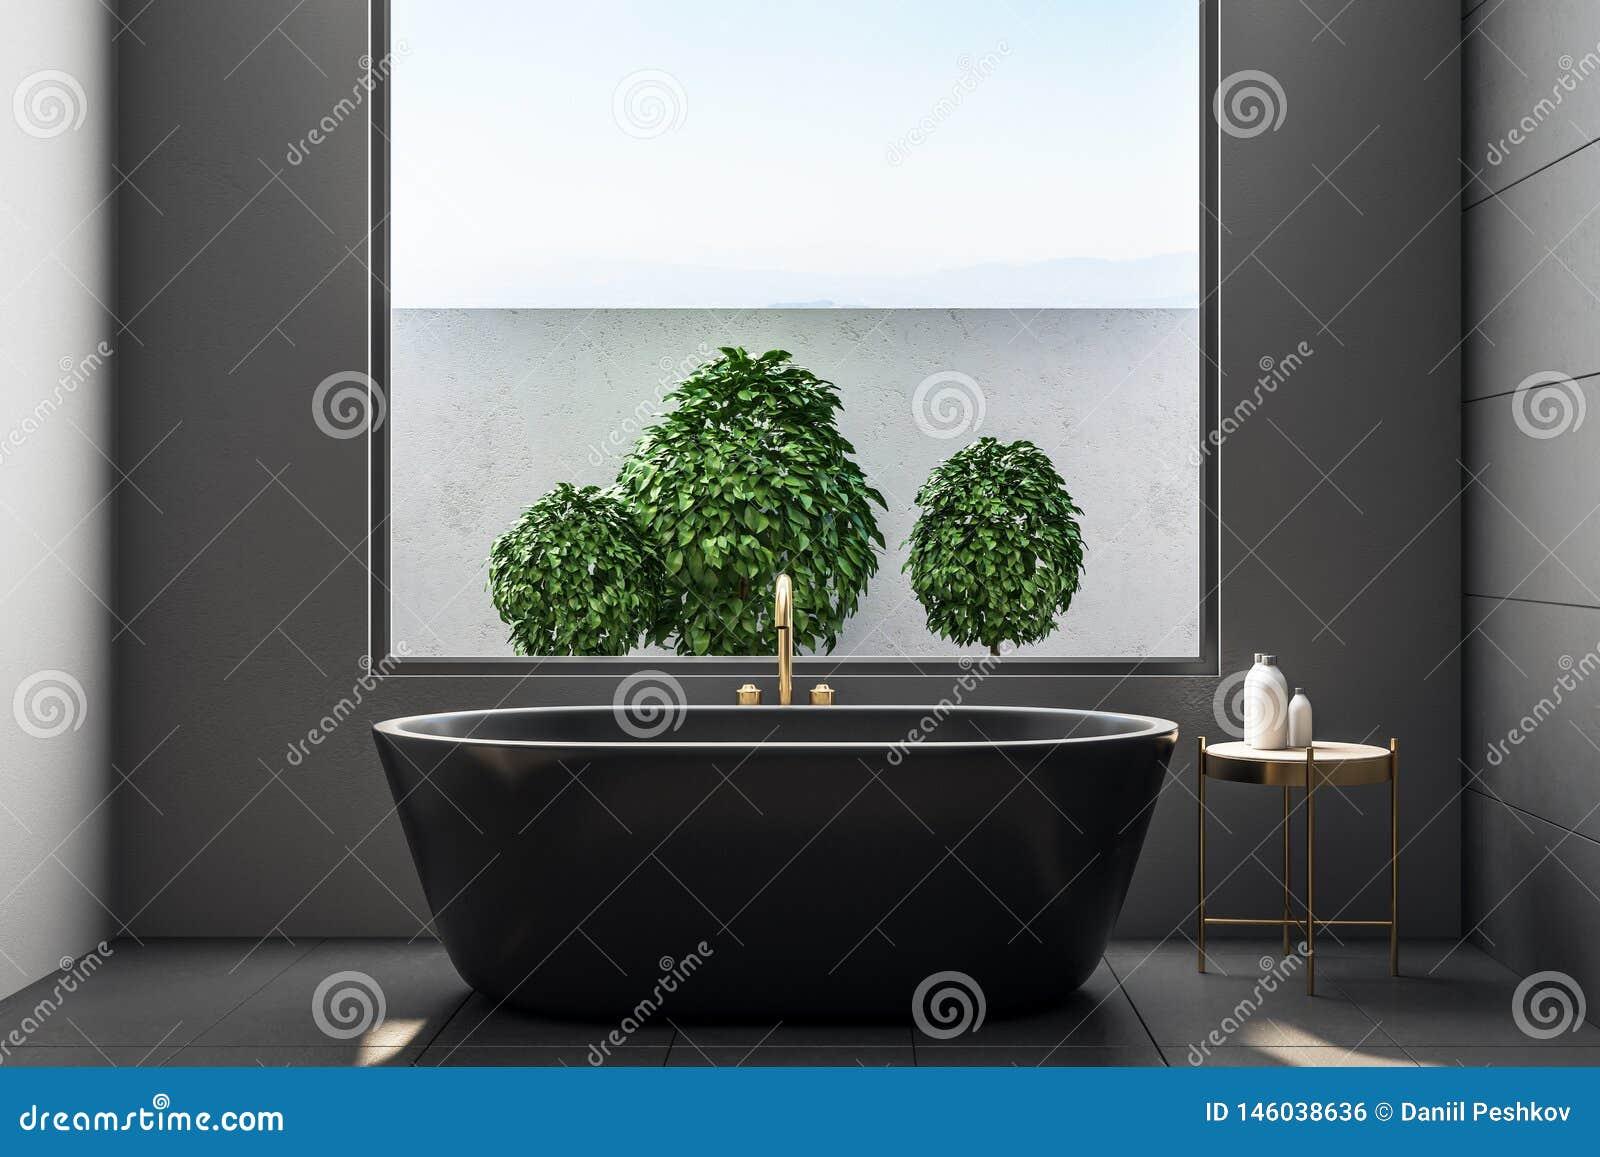 Luxury Bathroom Interior With Plants Stock Illustration Illustration Of Plant Decorative 146038636